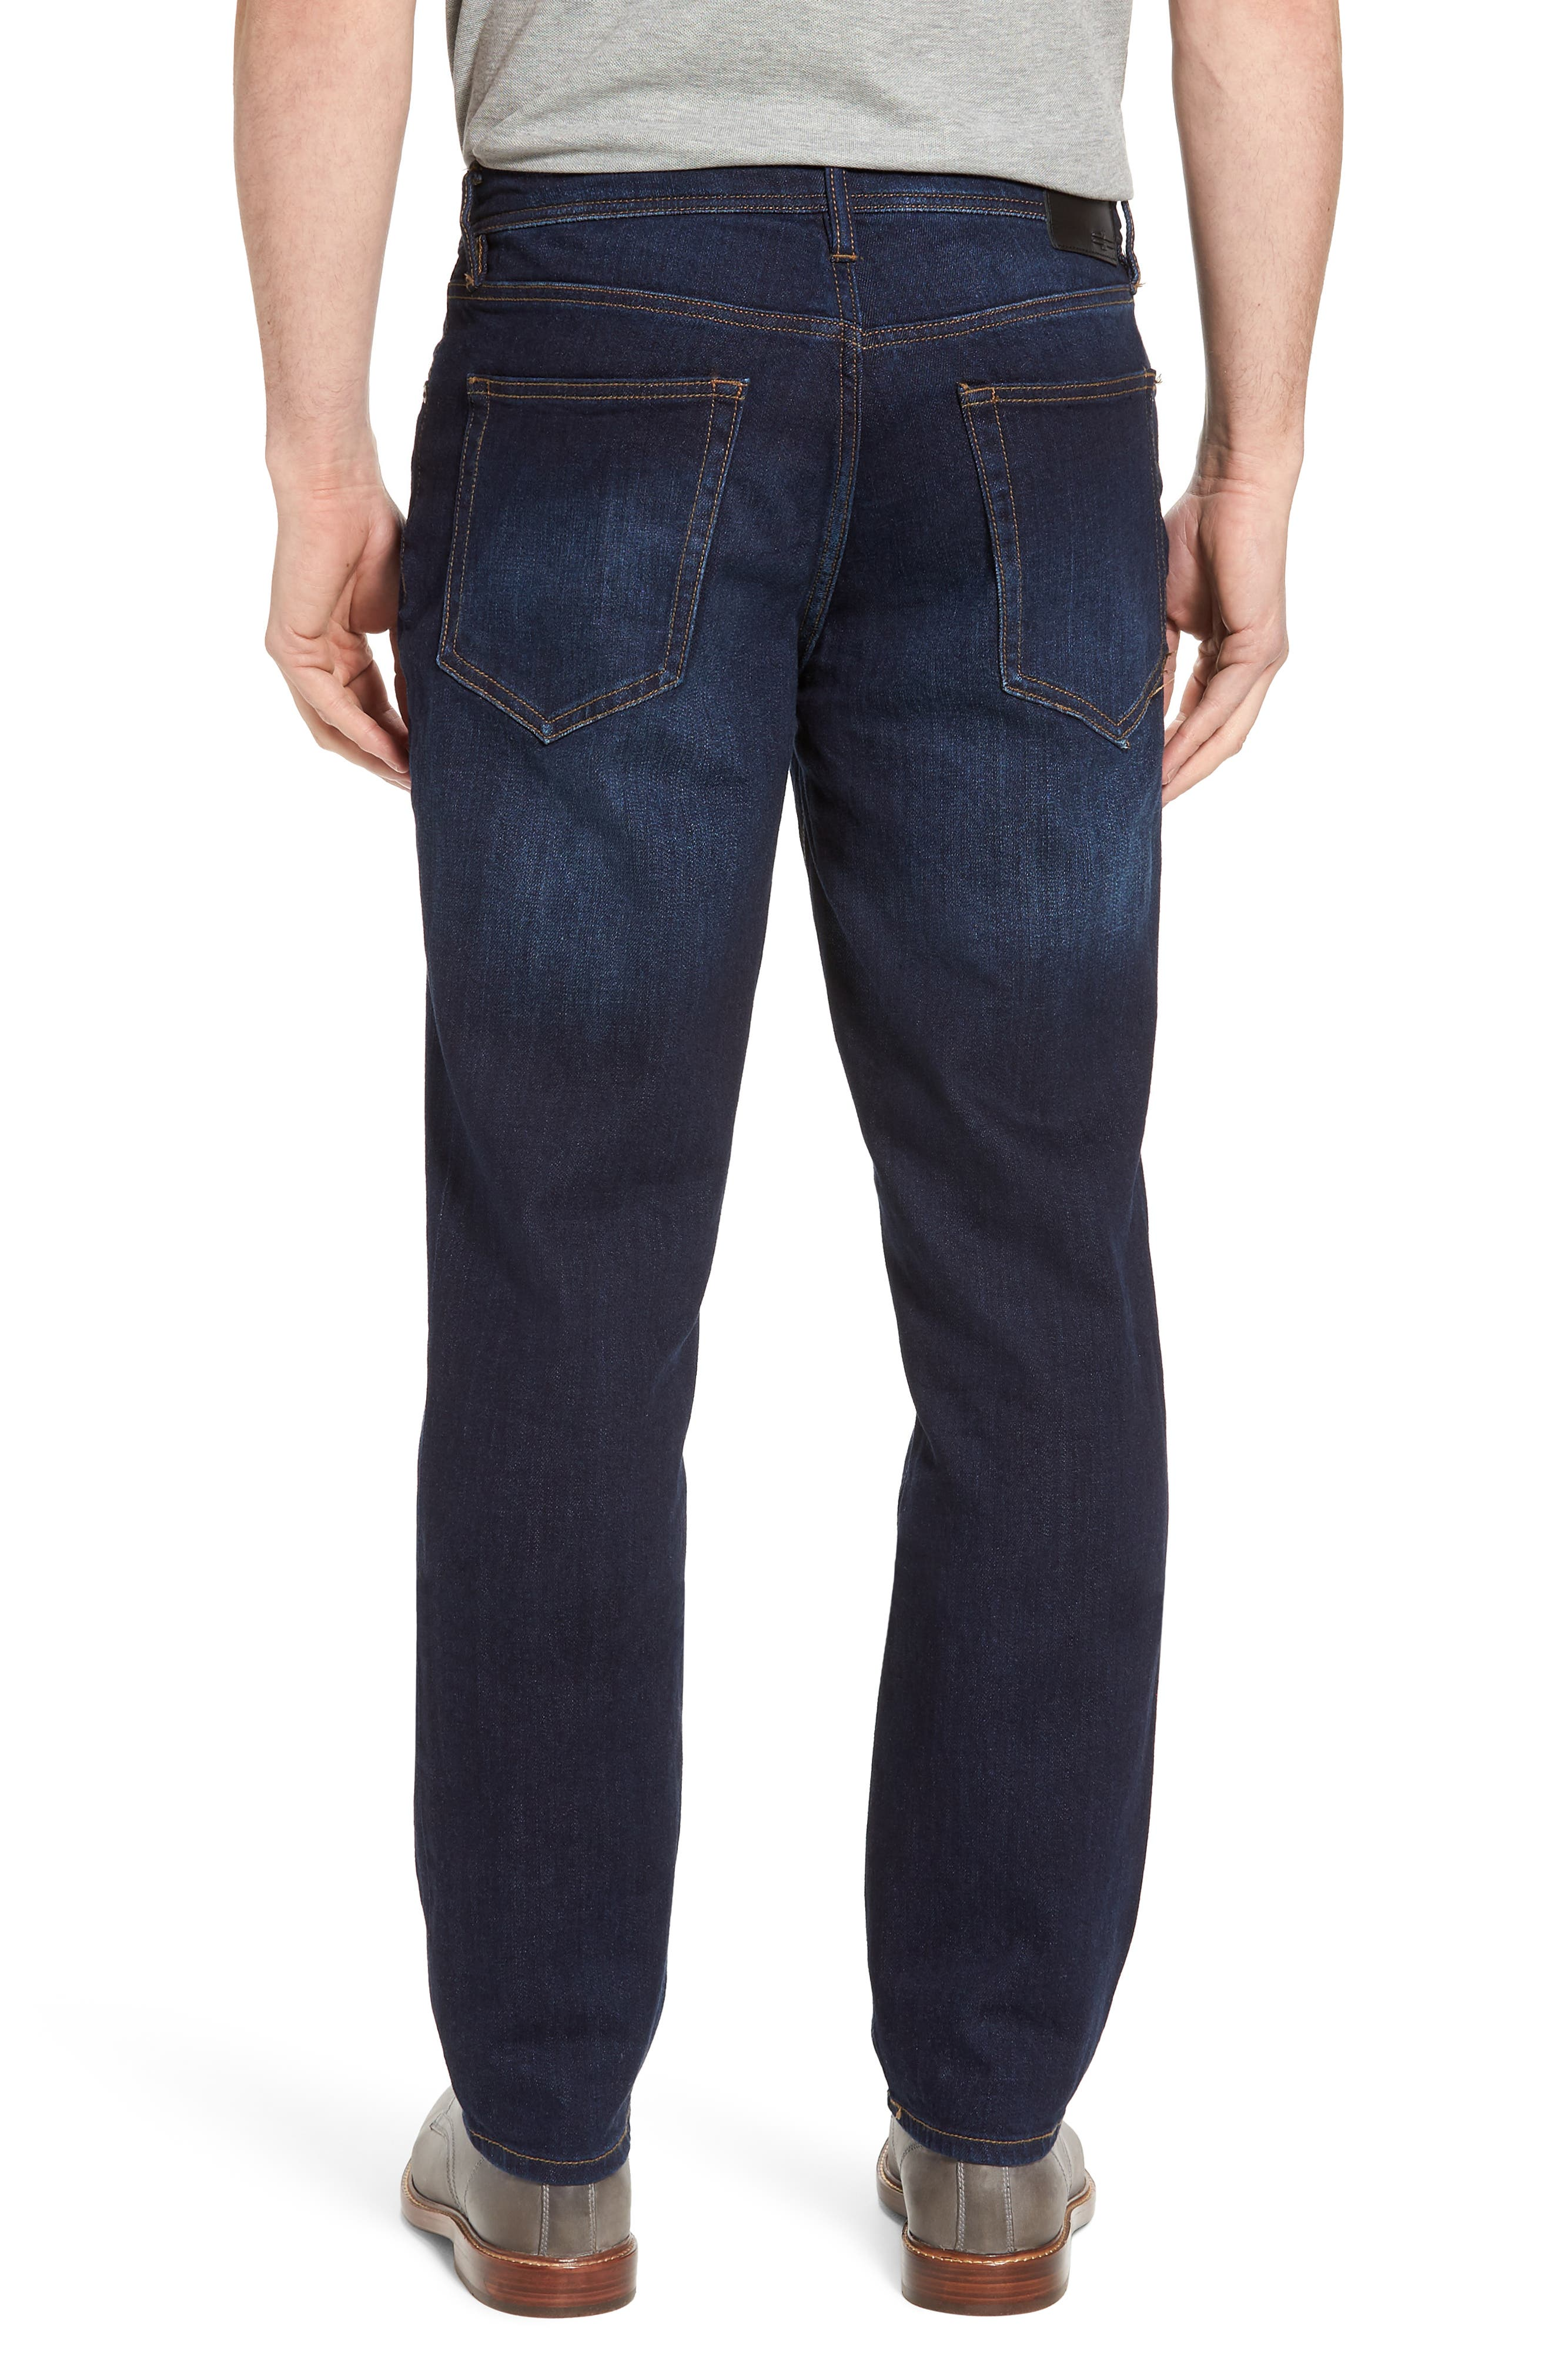 Jeans Co. Regent Relaxed Fit Jeans,                             Alternate thumbnail 2, color,                             San Ardo Vintage Dark